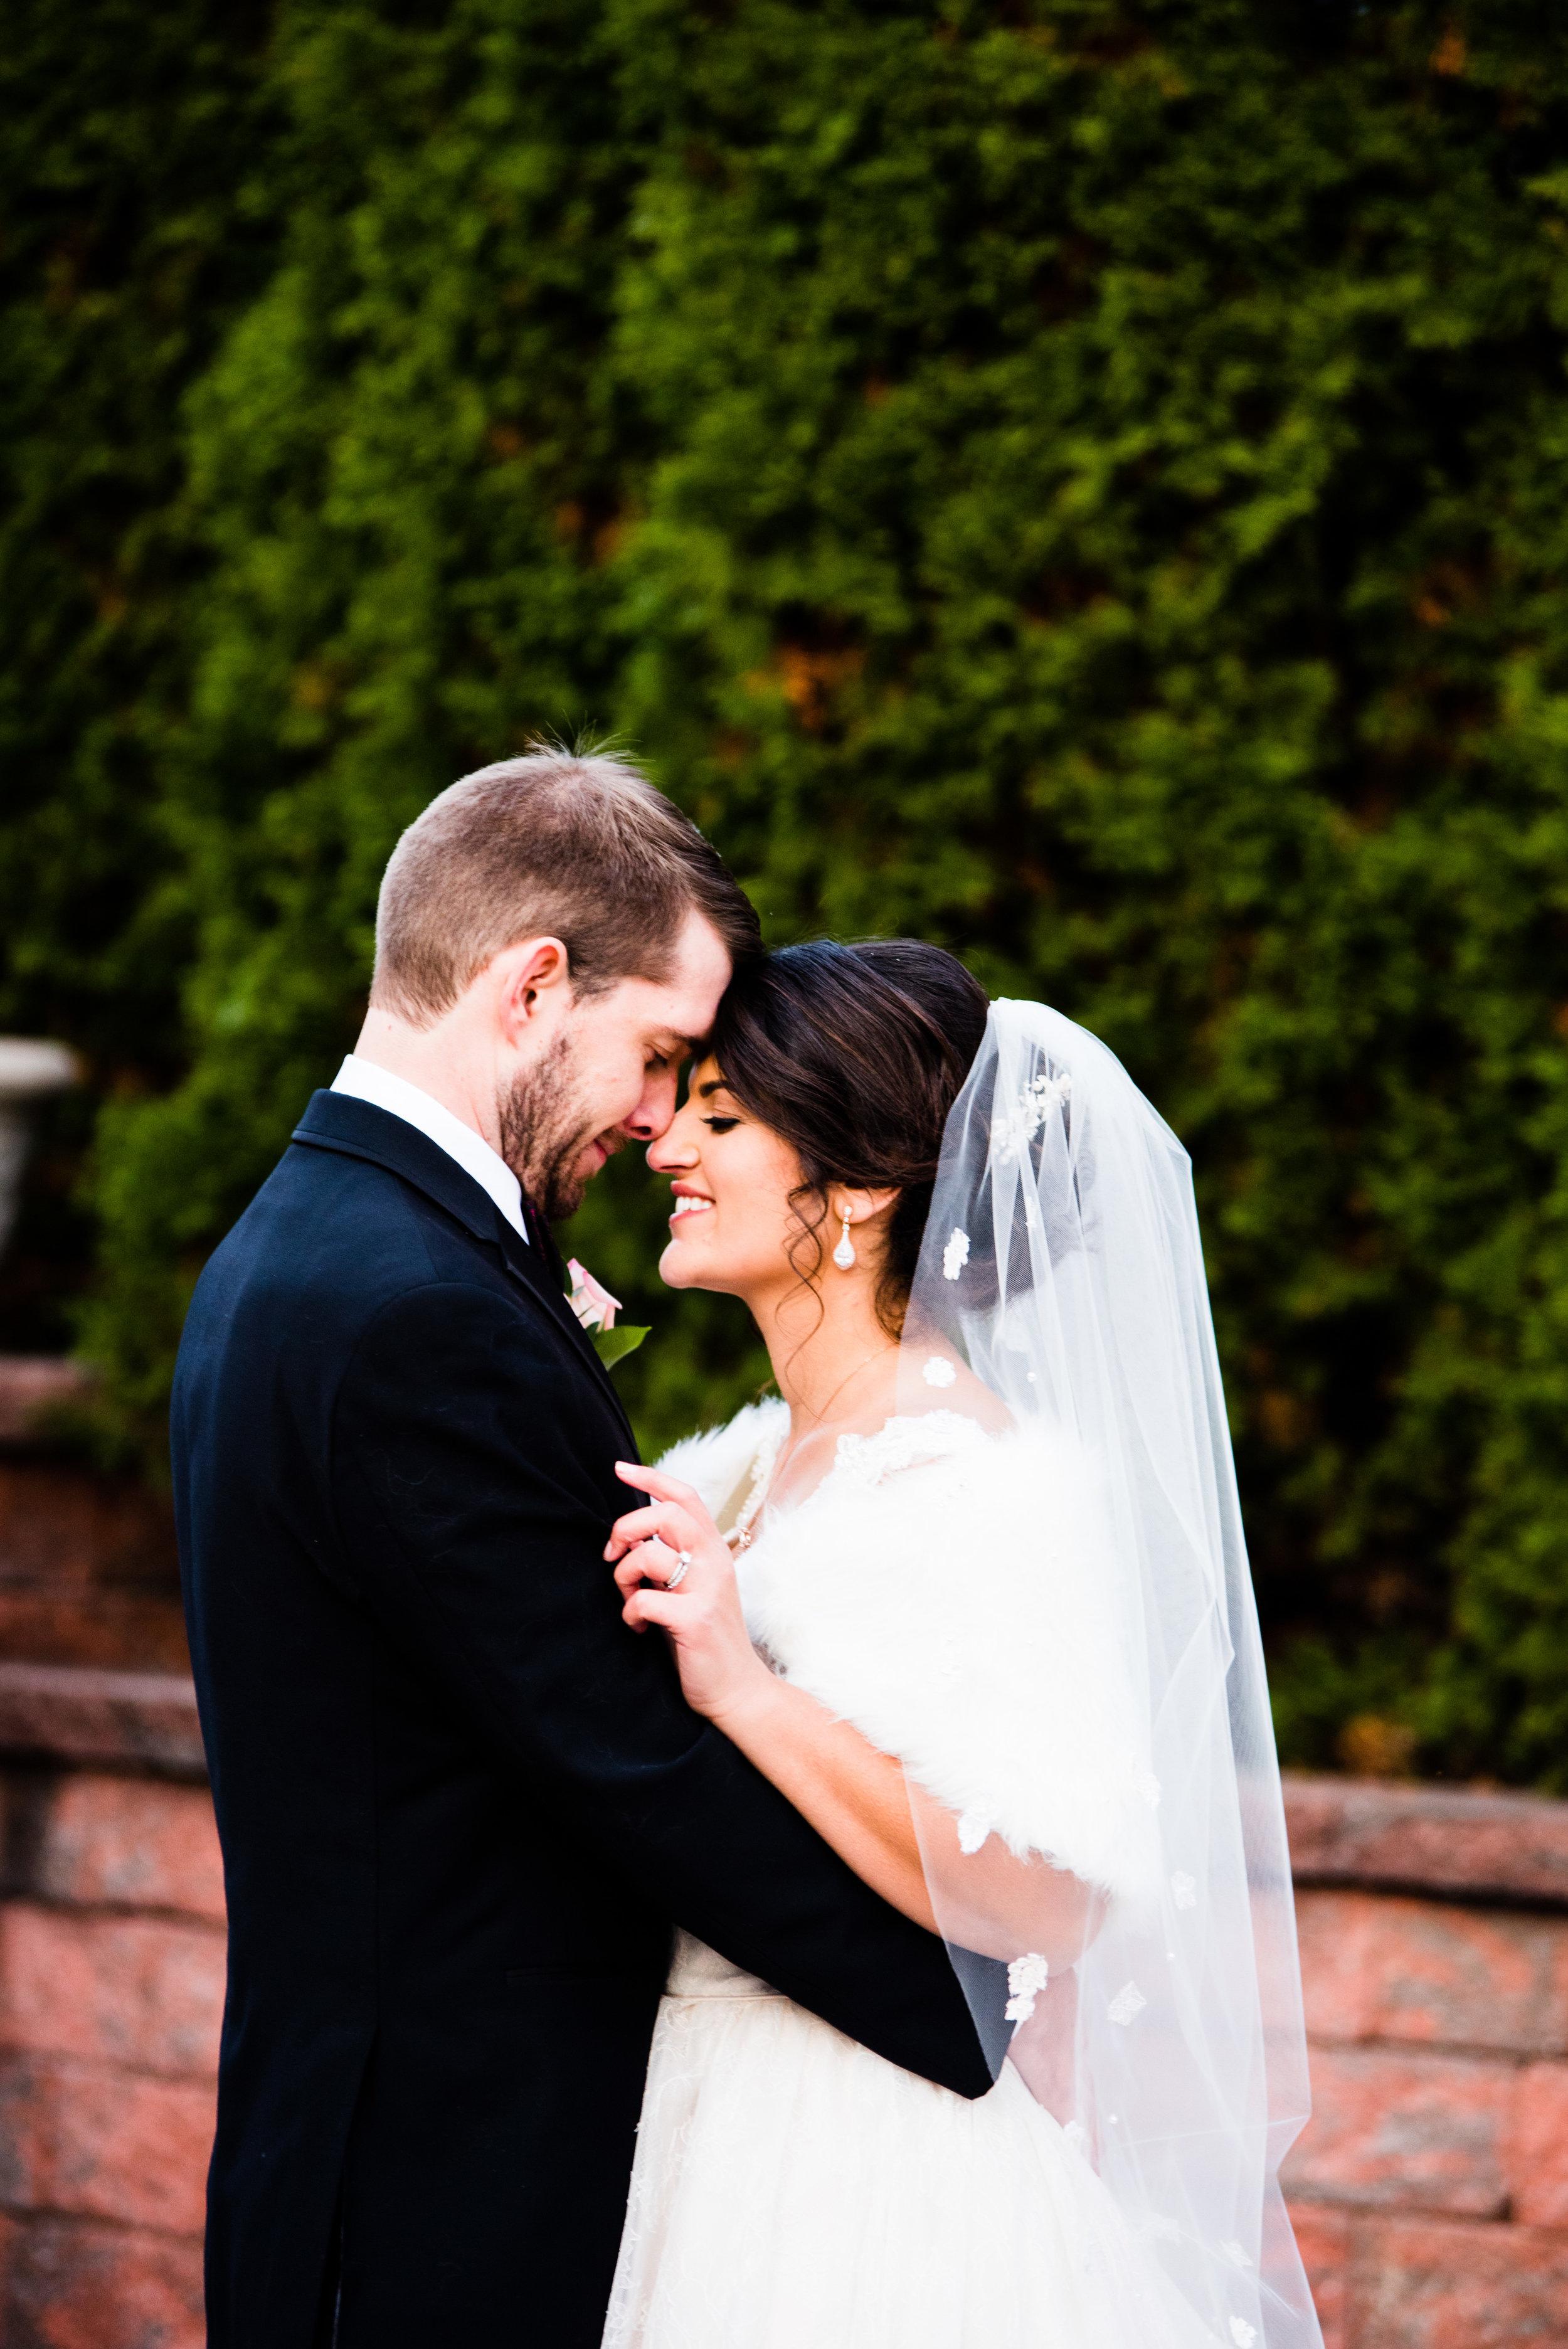 Luciens Manor Wedding Photos - 069.jpg